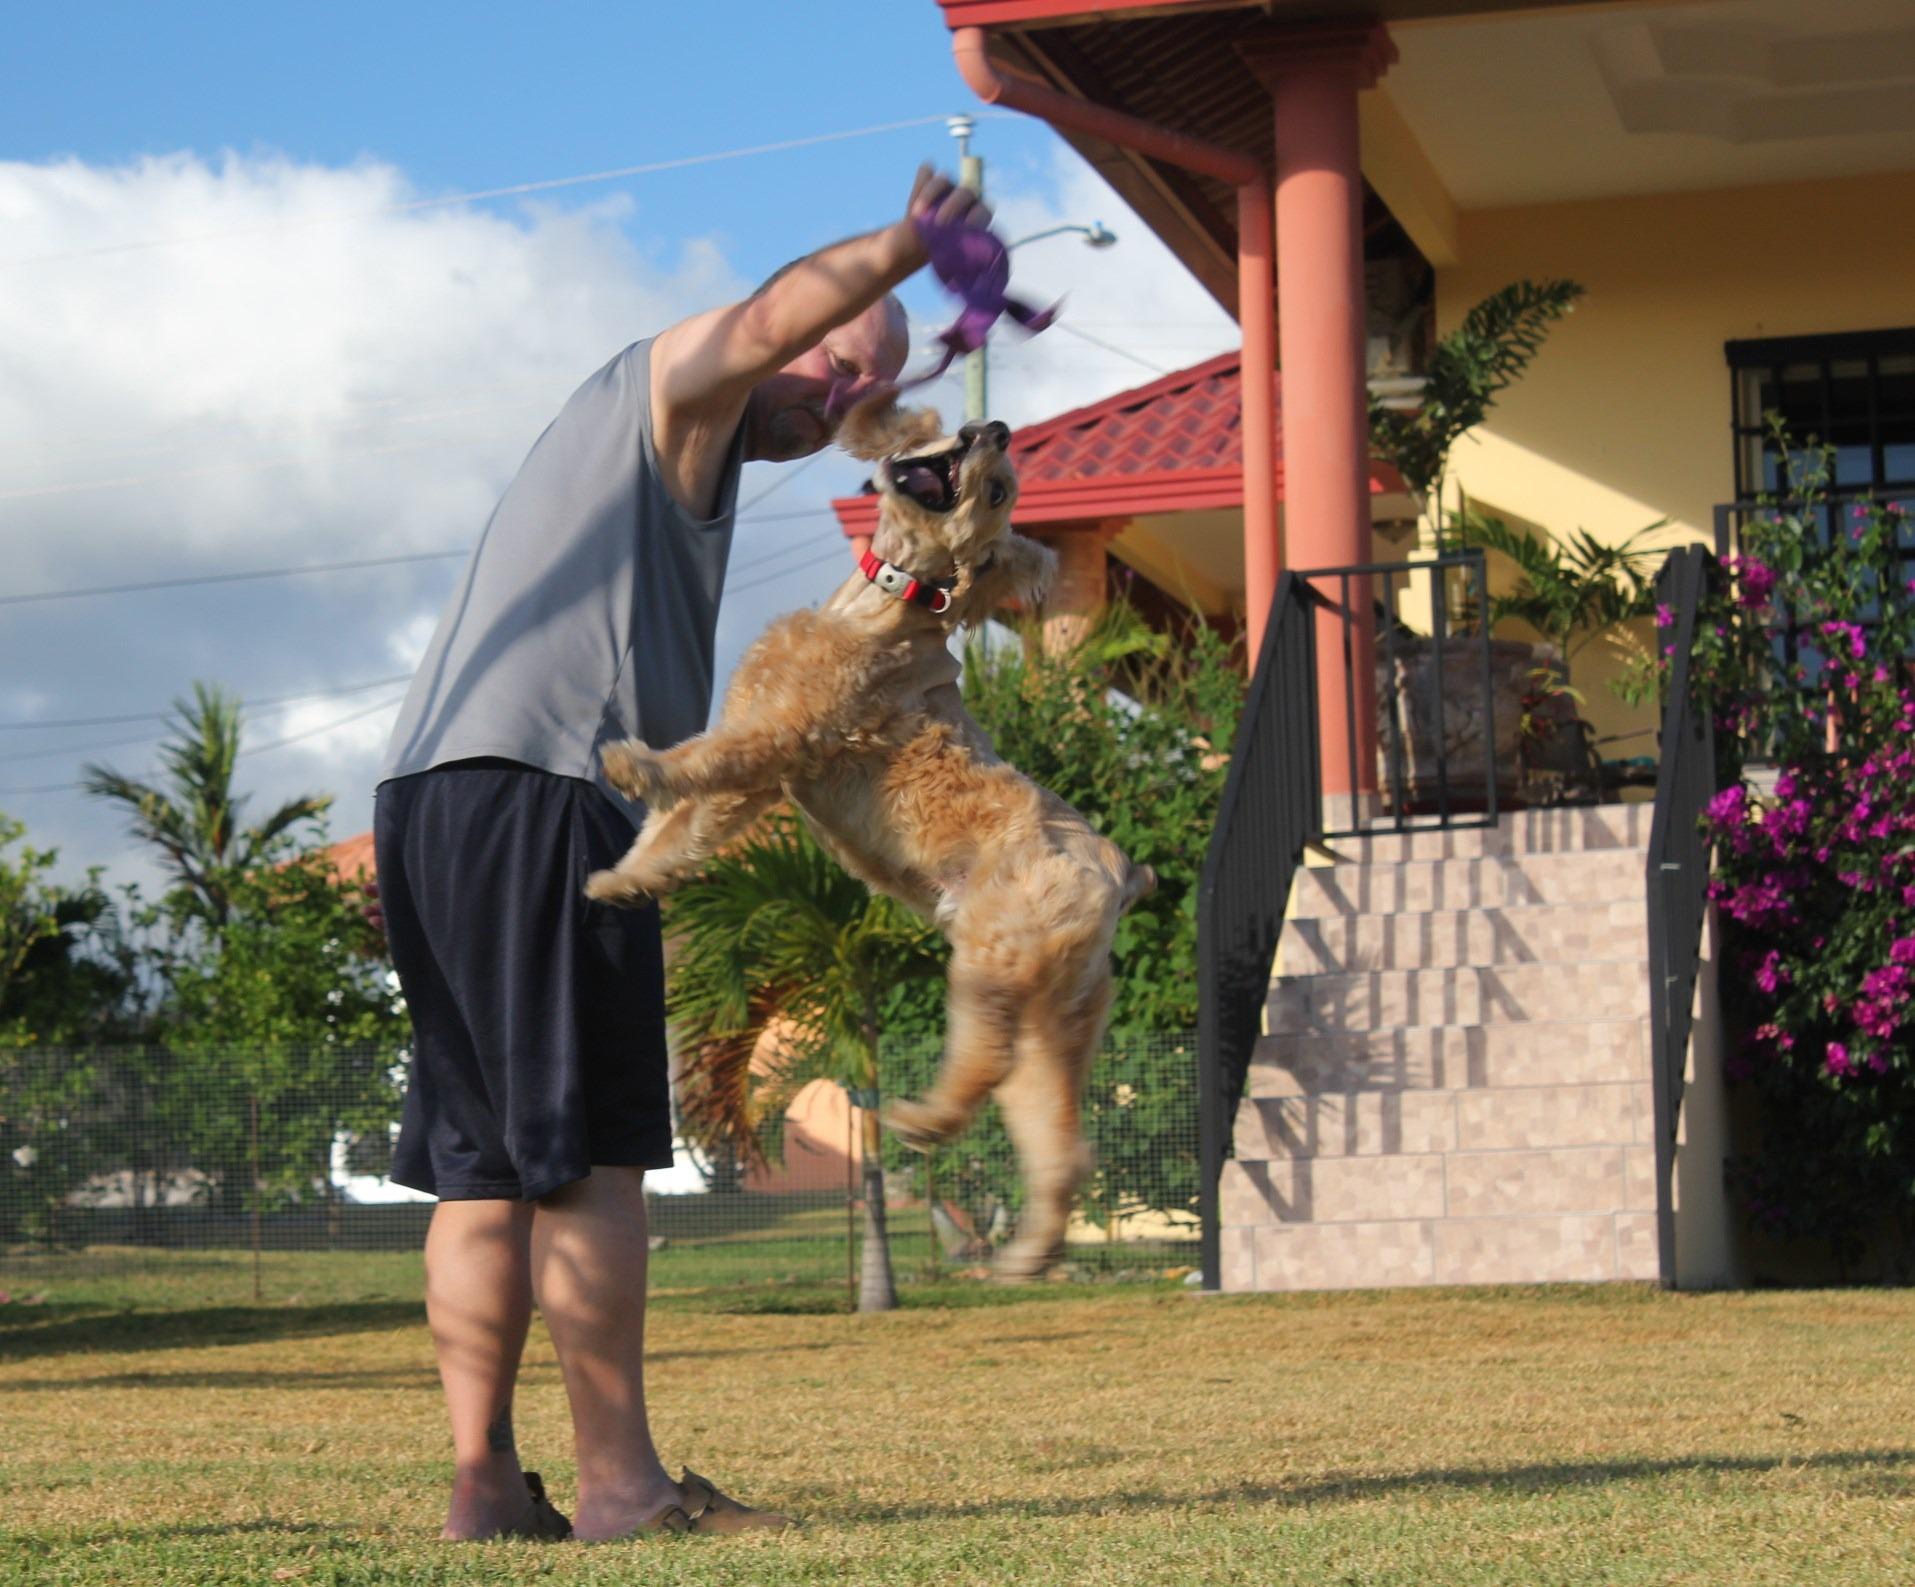 img_6874 Four to Tango Pets The Expat Life